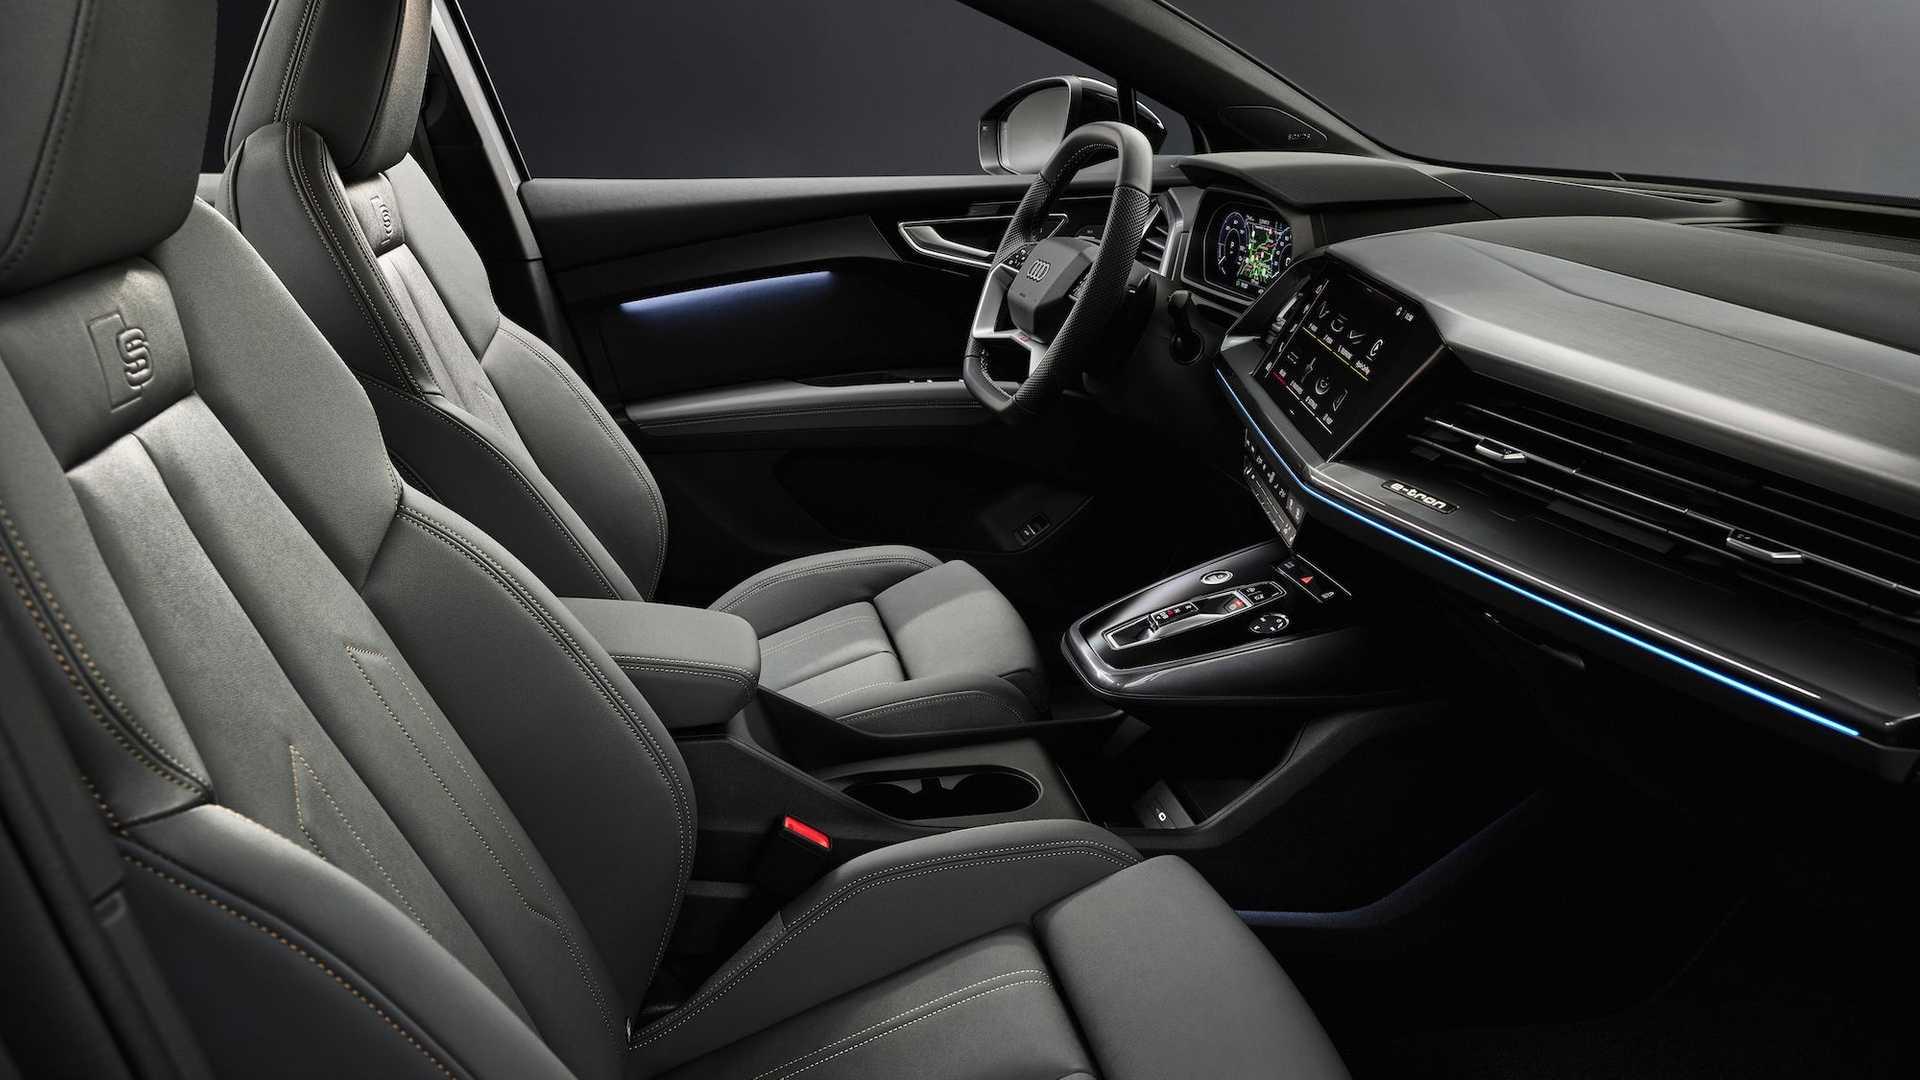 Audi-Q4-e-tron-9.jpg